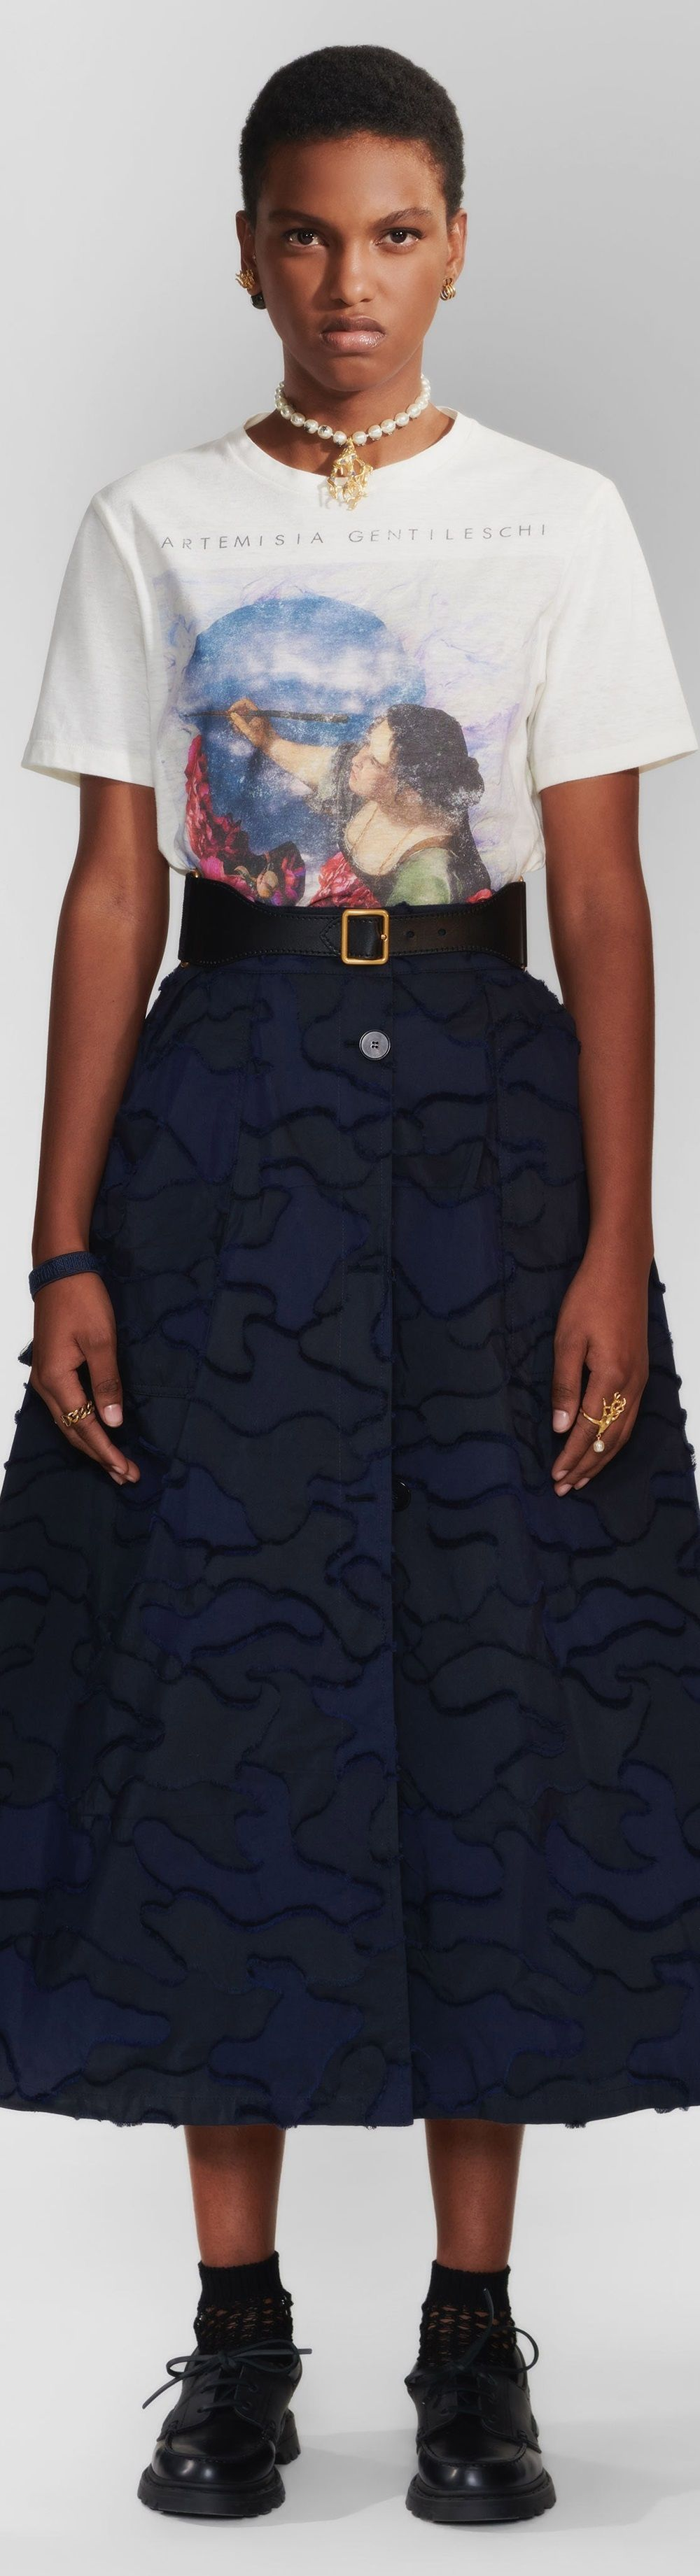 Photo of Christian Dior Pre-Fall 2020